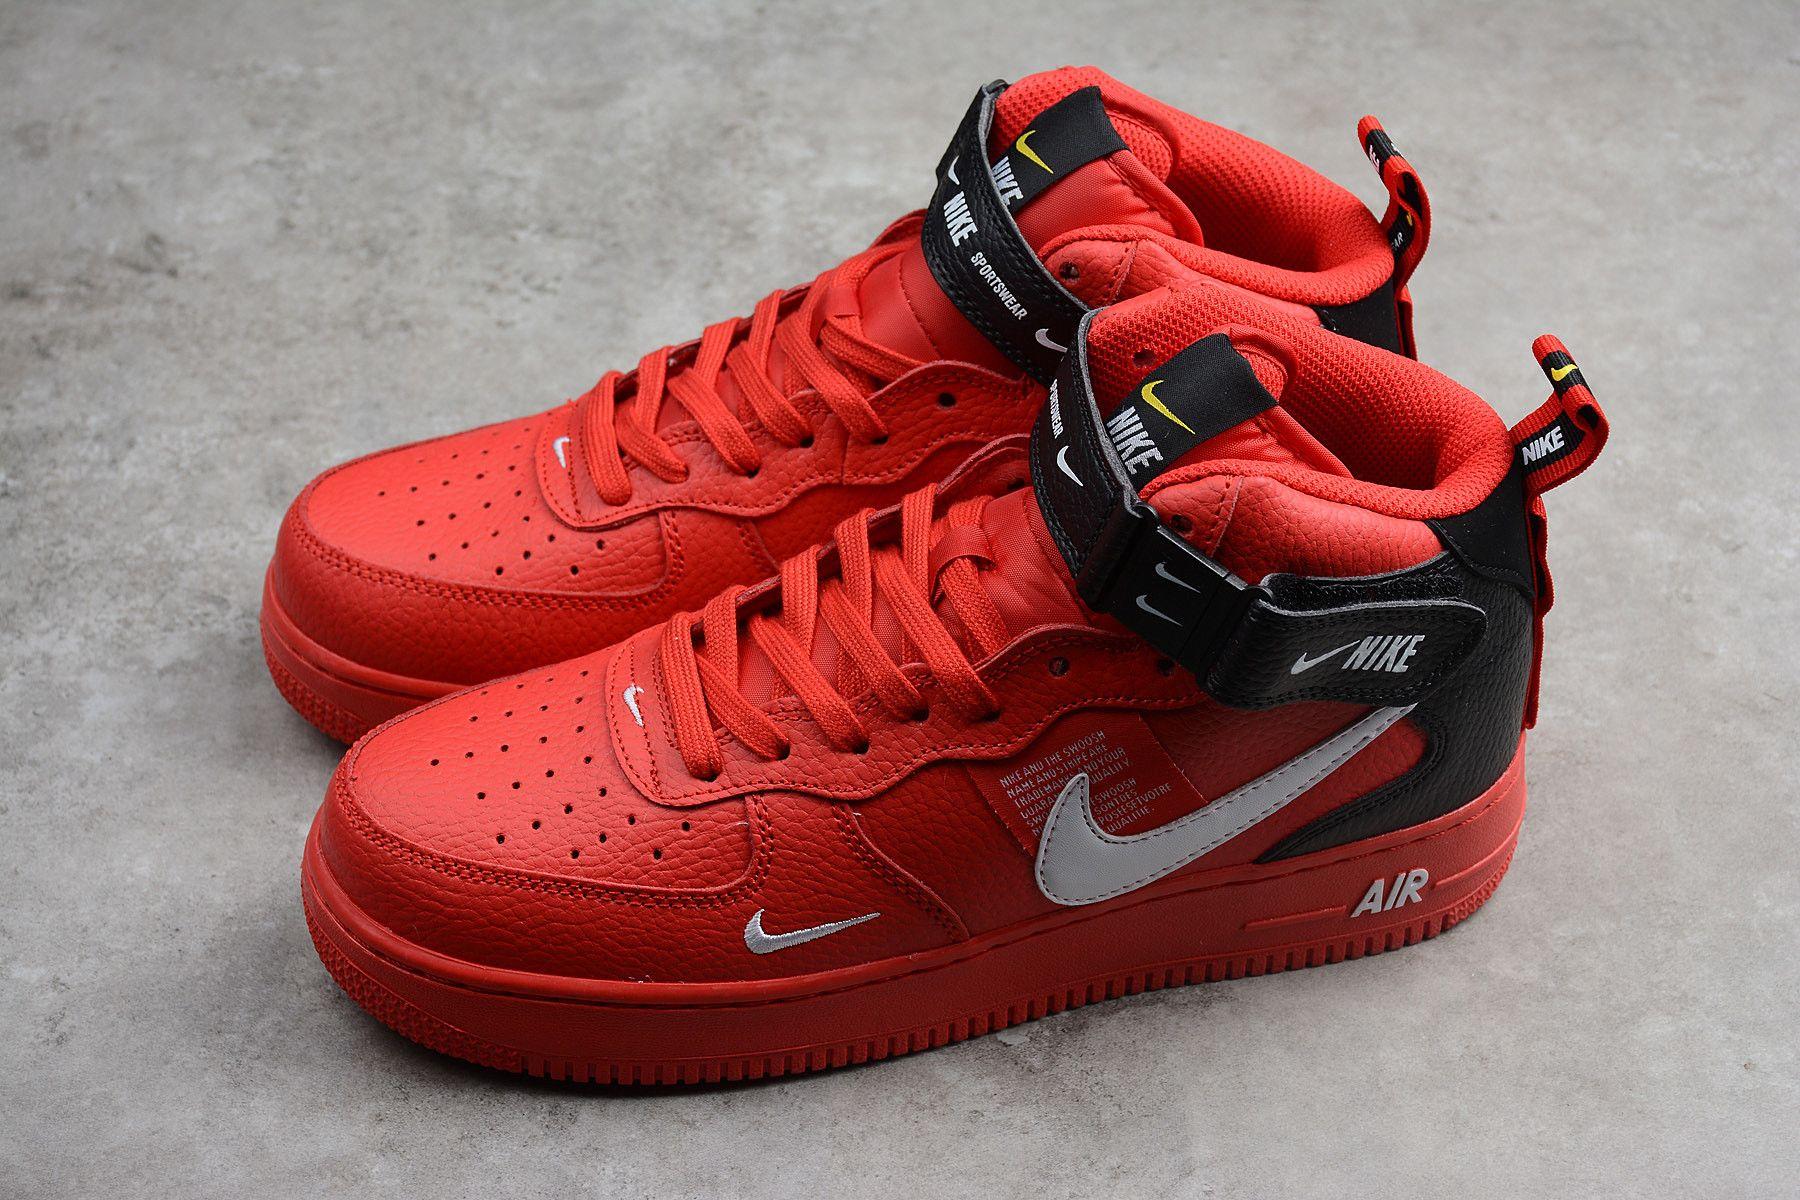 Nike Air Force 1 Mid University Red White Black Tour Yellow For Sale Jordans 2019 Cheap Sneakers Men Fashion Sneakers Fashion Sneakers